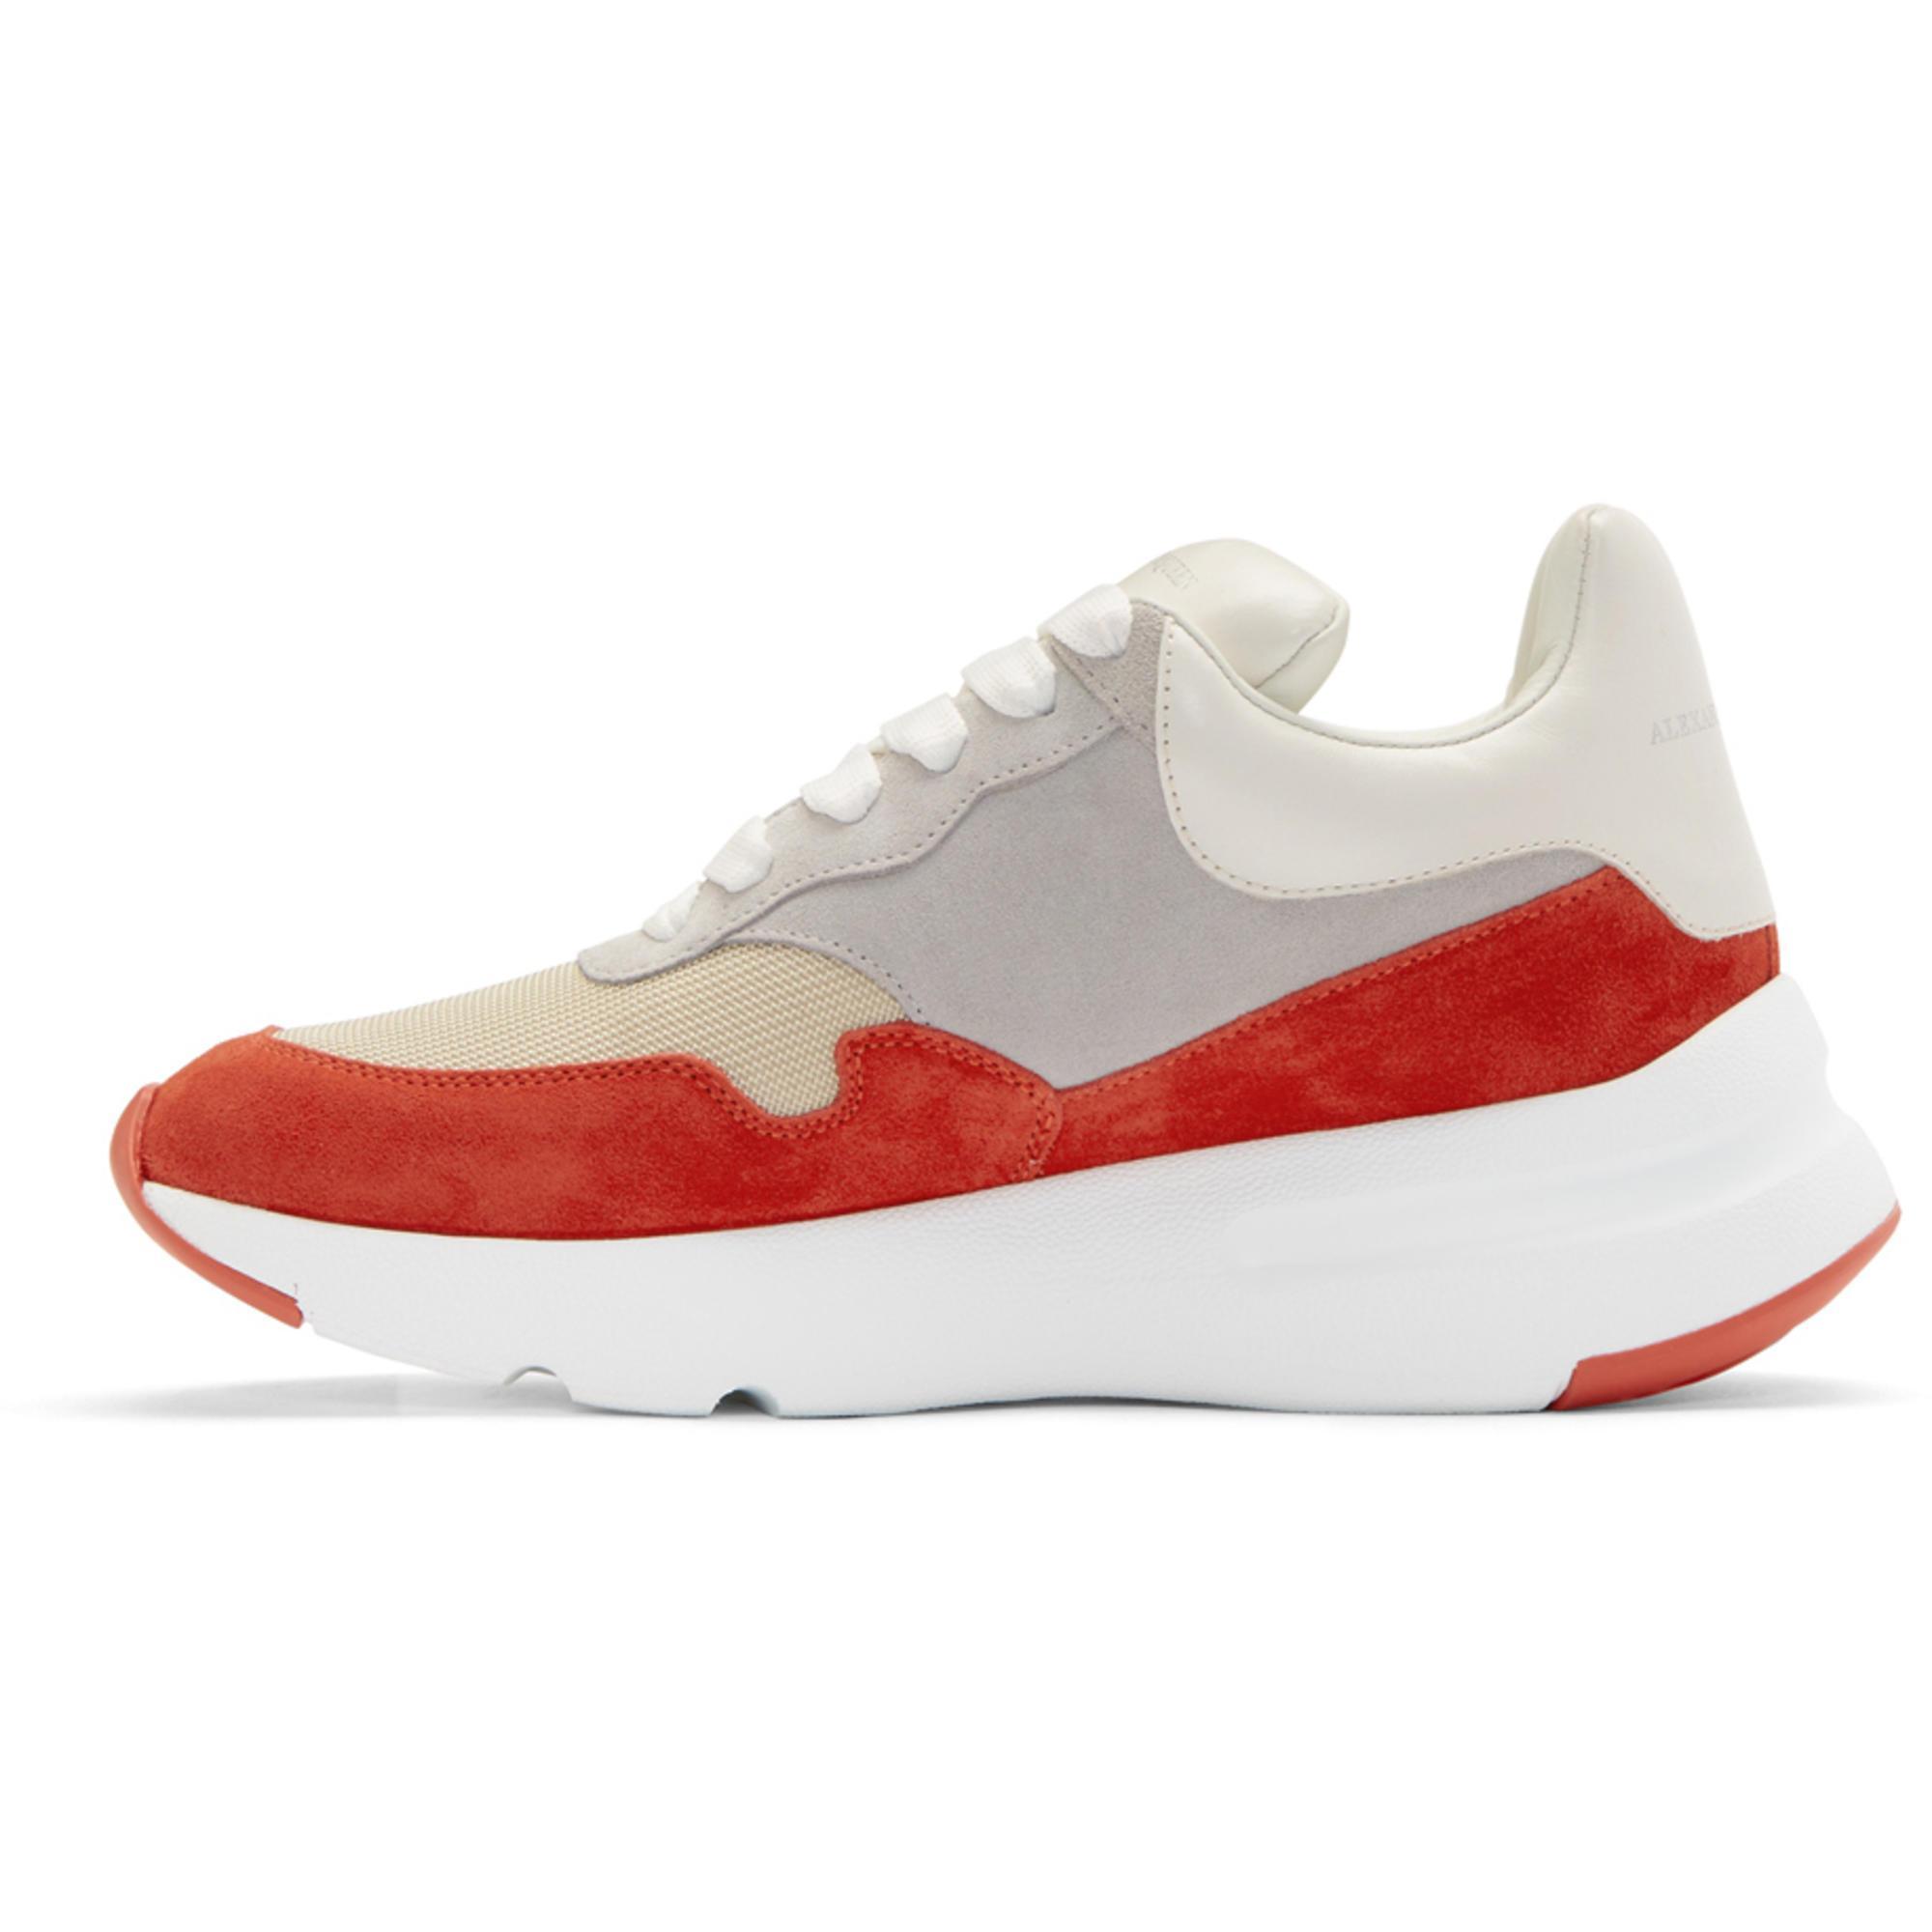 Alexander McQueen Red & White Colorblock Sneakers kCoPgrdi0t